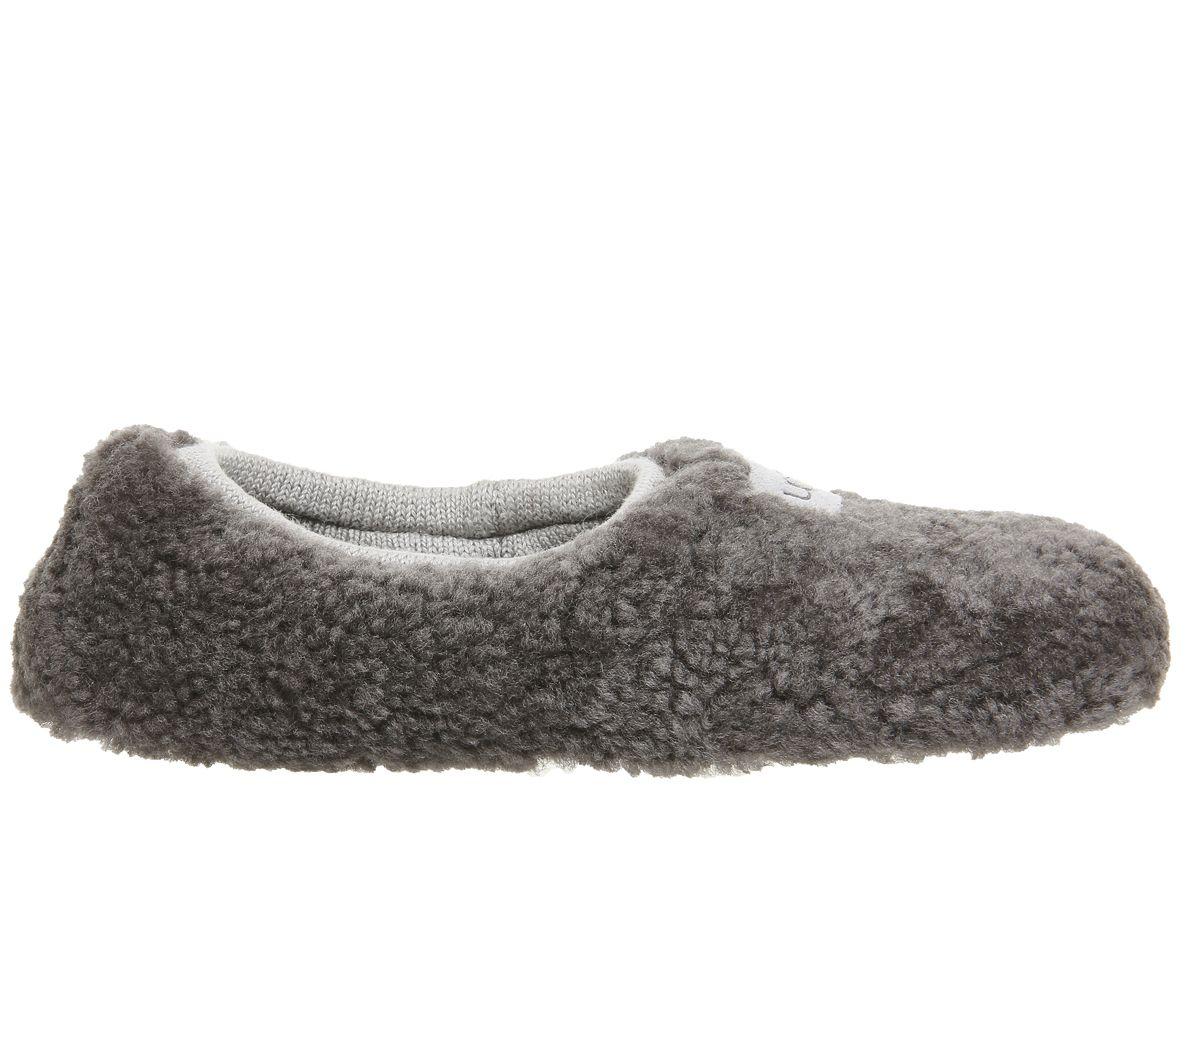 3c2681e9e06b UGG Birche Slippers Grey - Flats